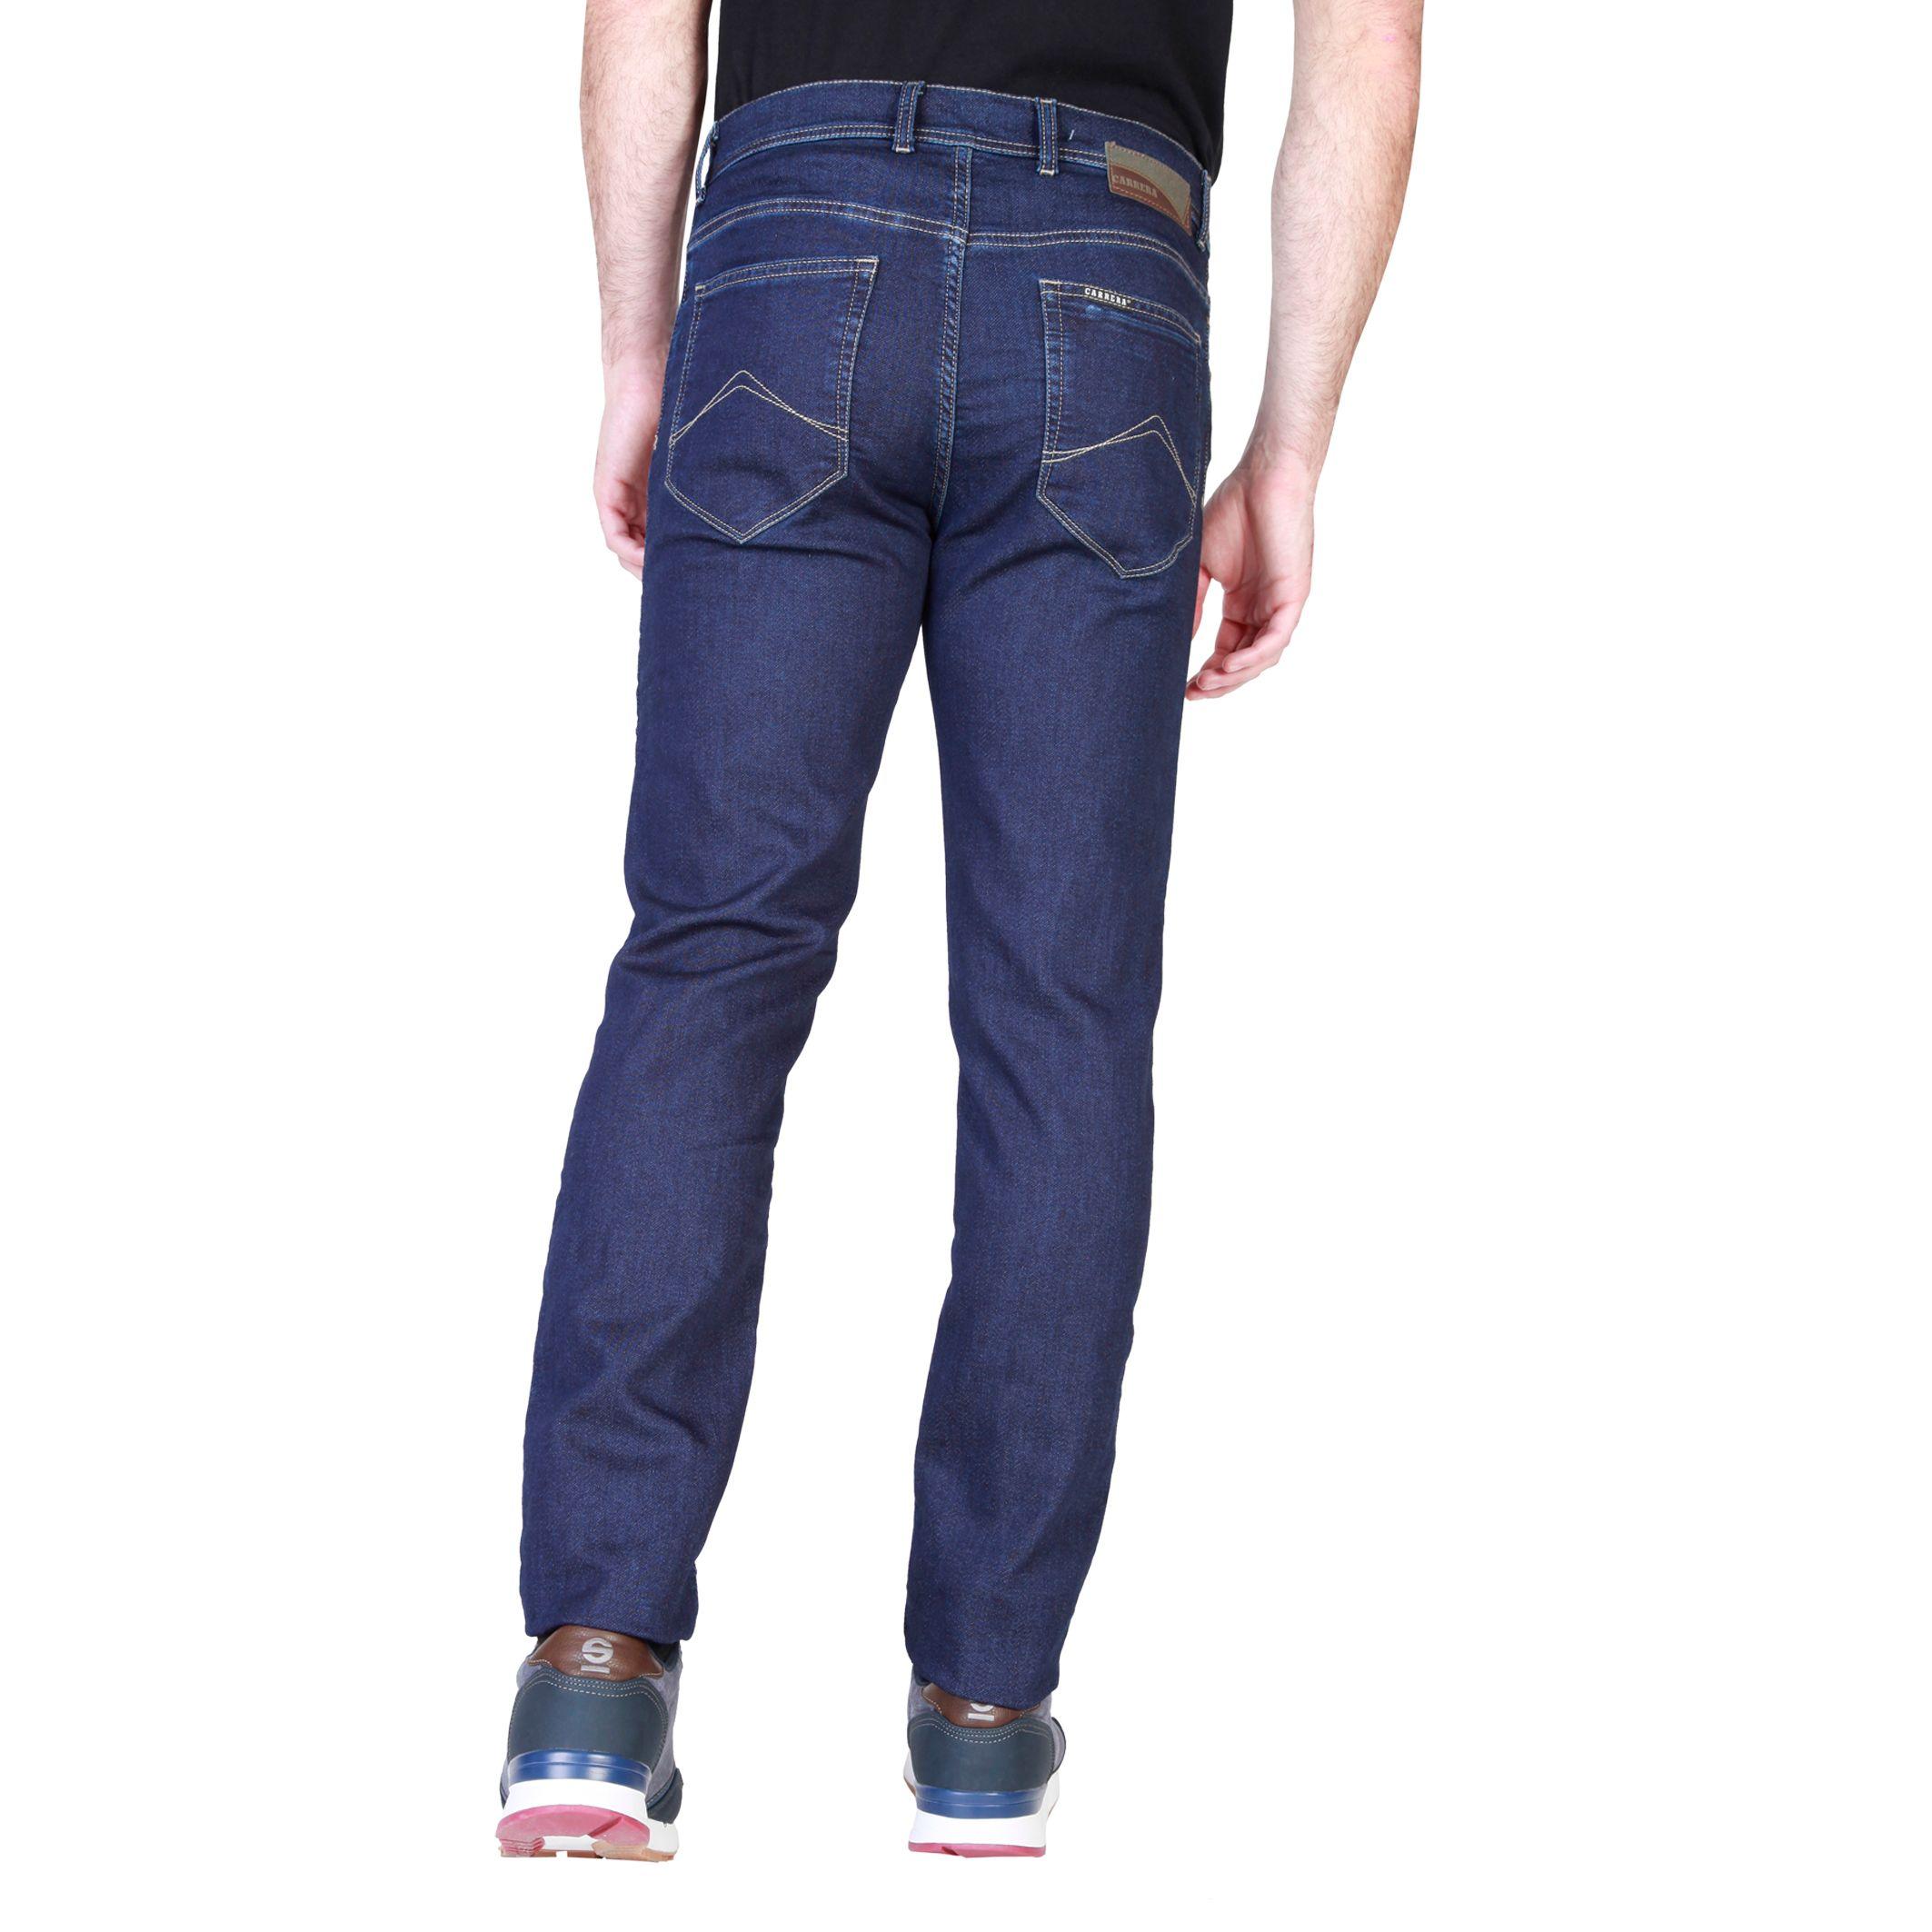 Carrera Jeans – 0T707M_0900A